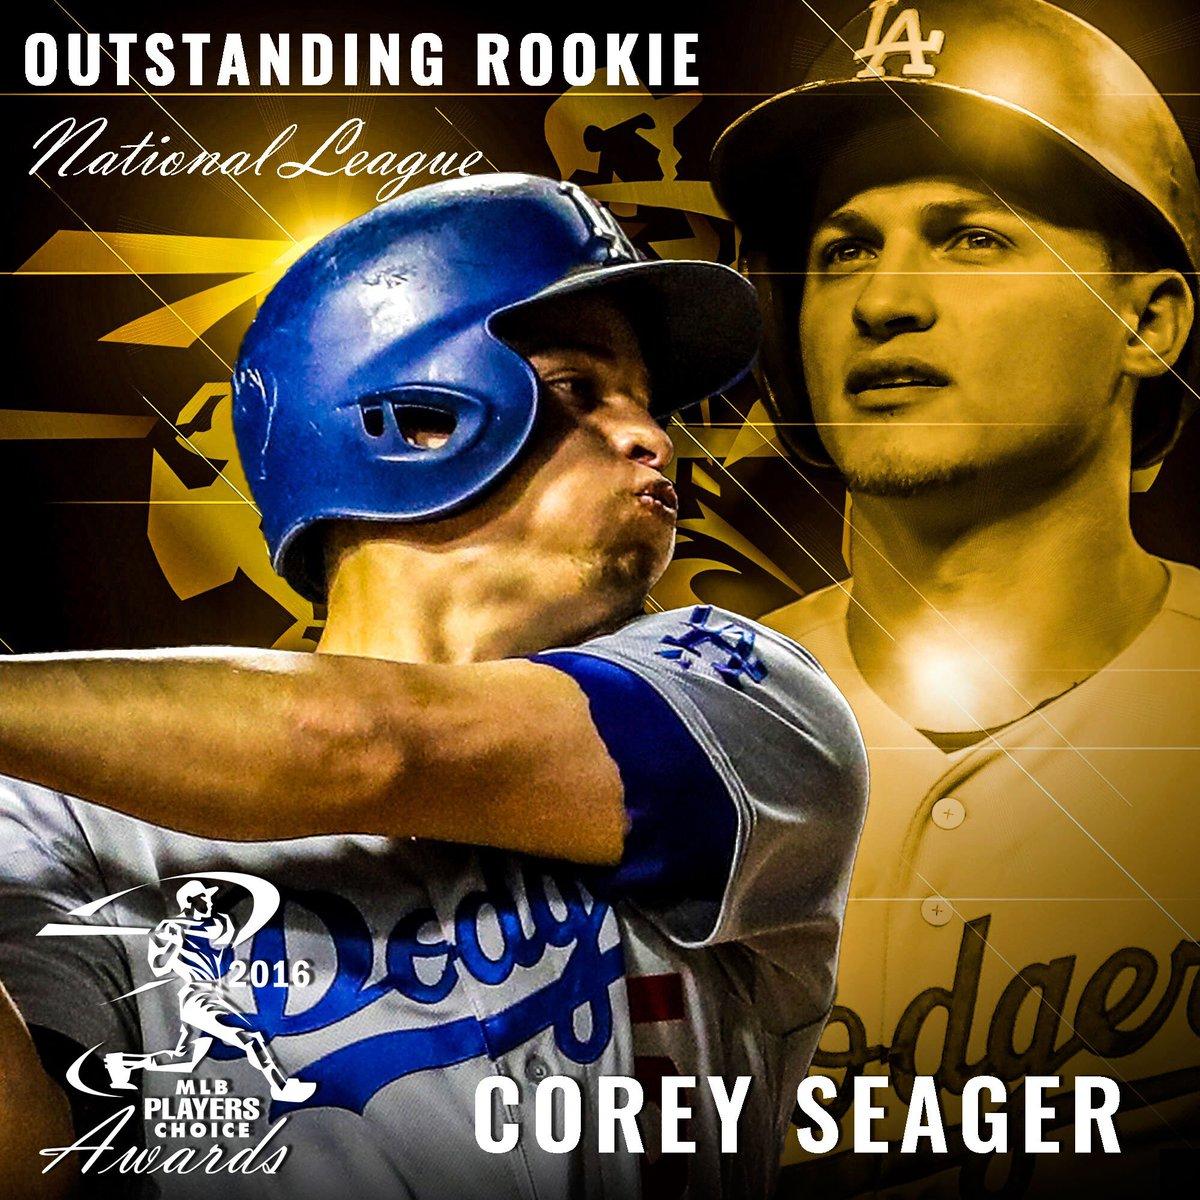 Welcome to @MLBTheShow! Congrats #PlayersChoiceAwards16 NL #OutstandingRookie @coreyseager_5 @Dodgers https://t.co/f4MJBiRHwU